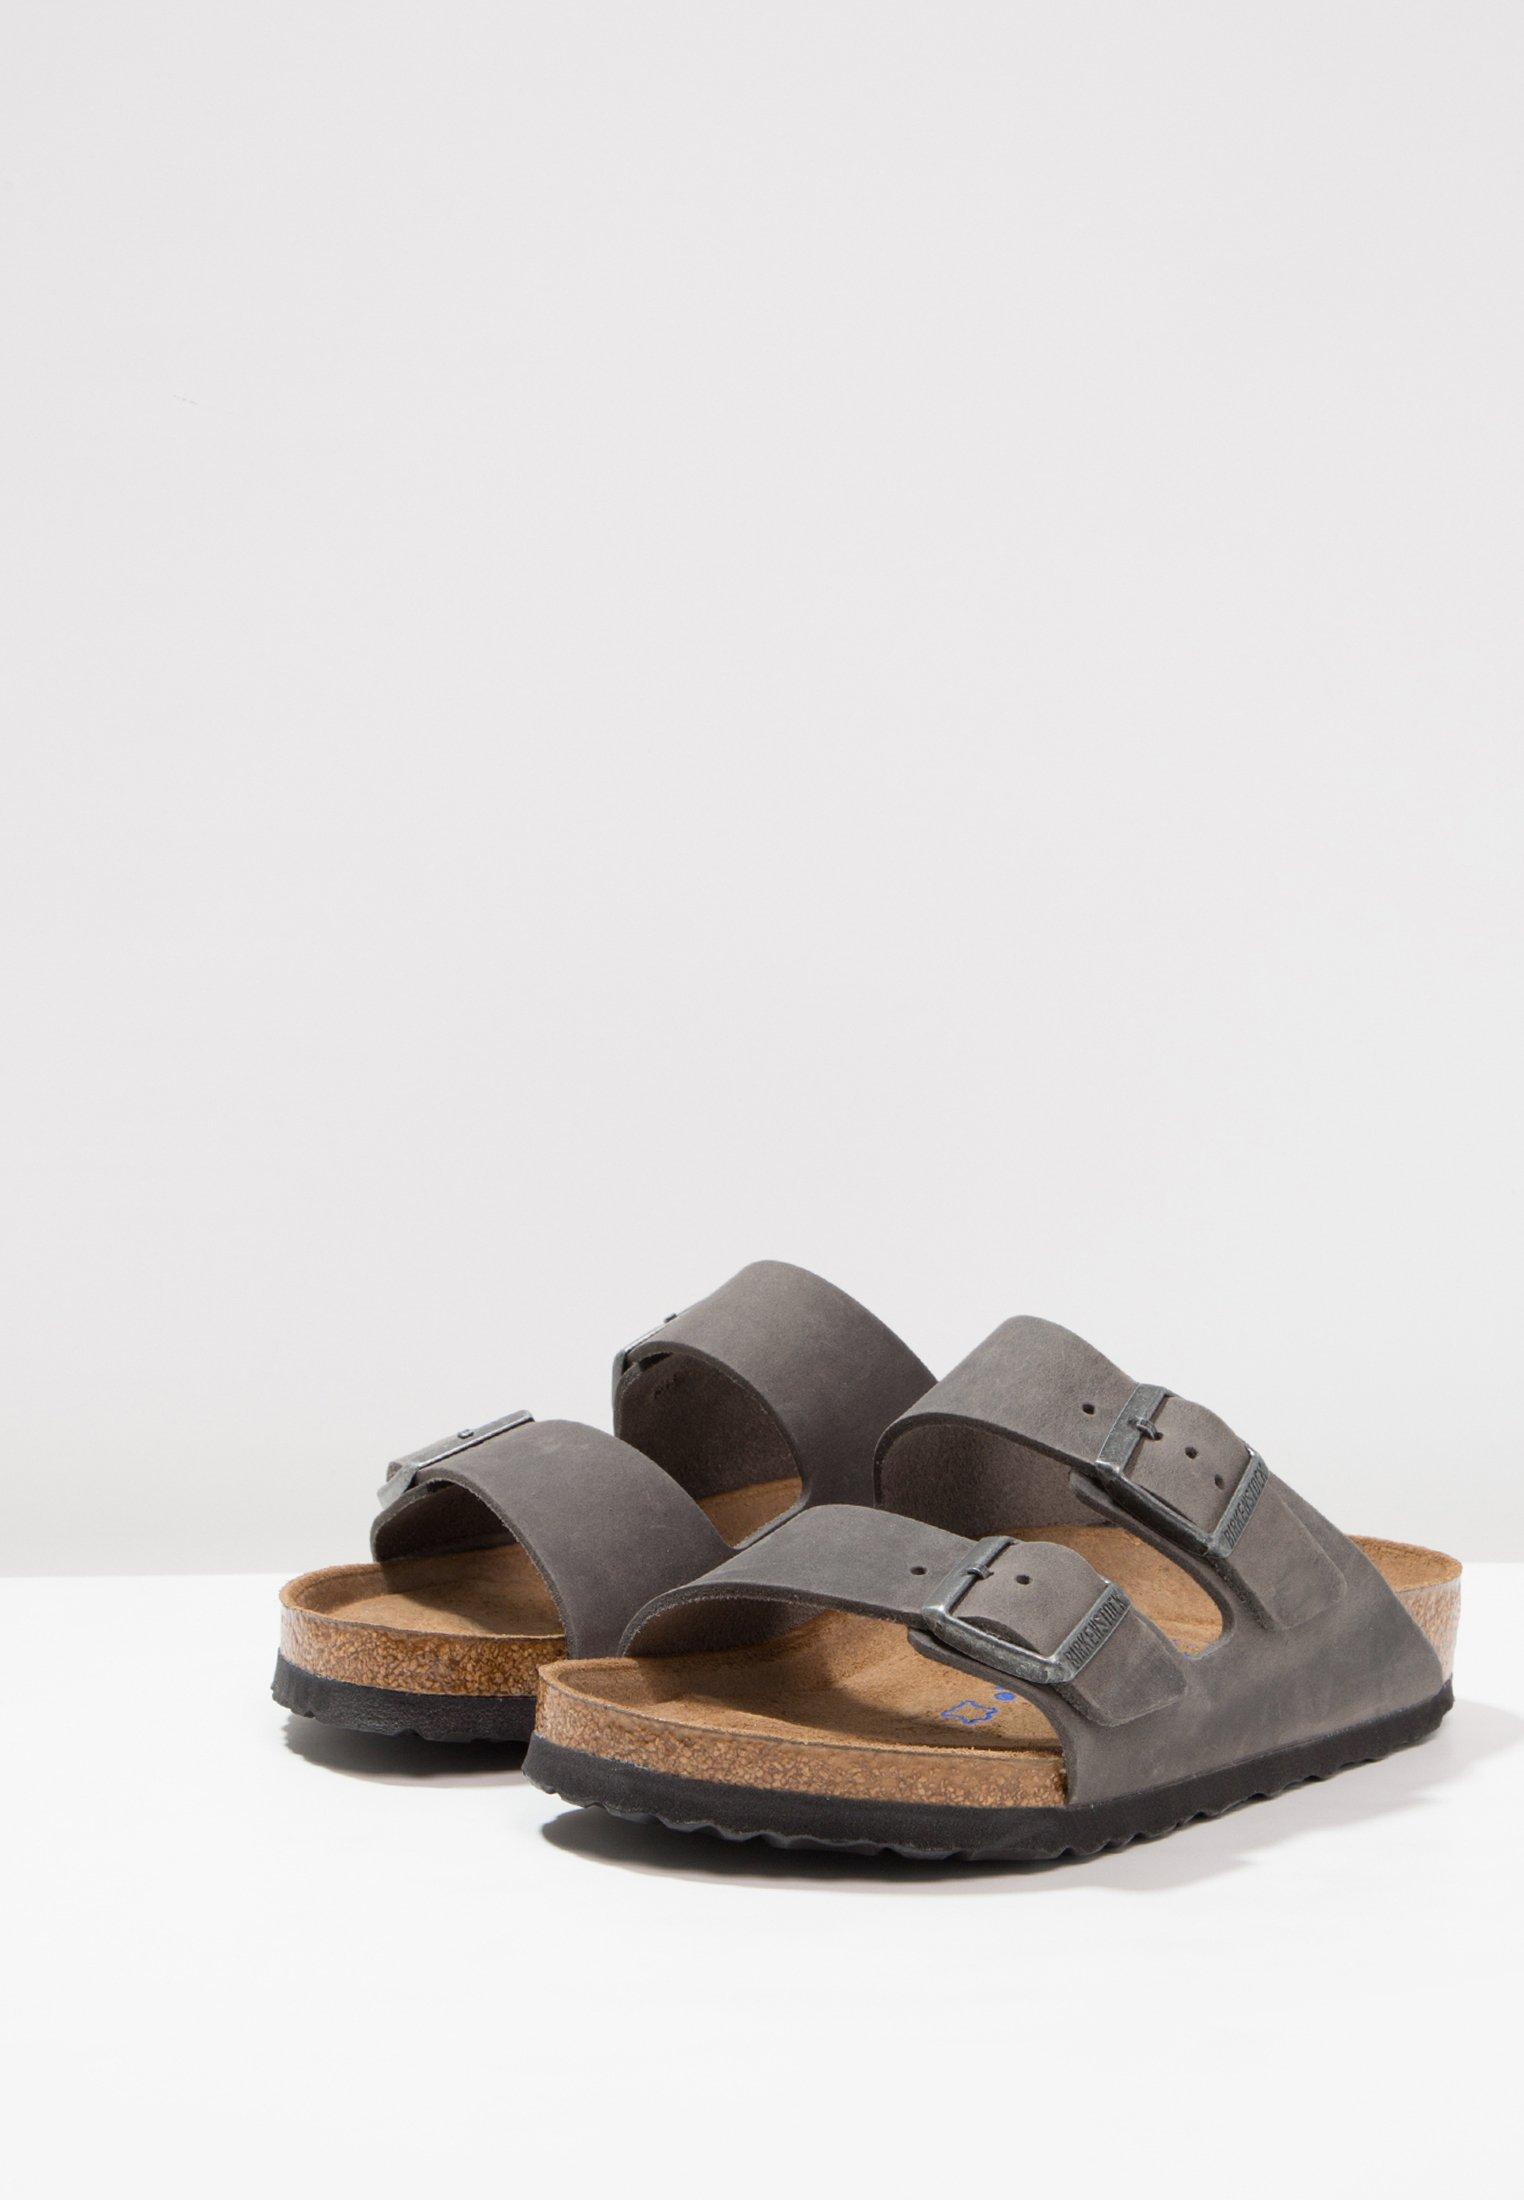 Birkenstock ARIZONA SOFT FOOTBED Pantolette flach iron/dunkelgrau